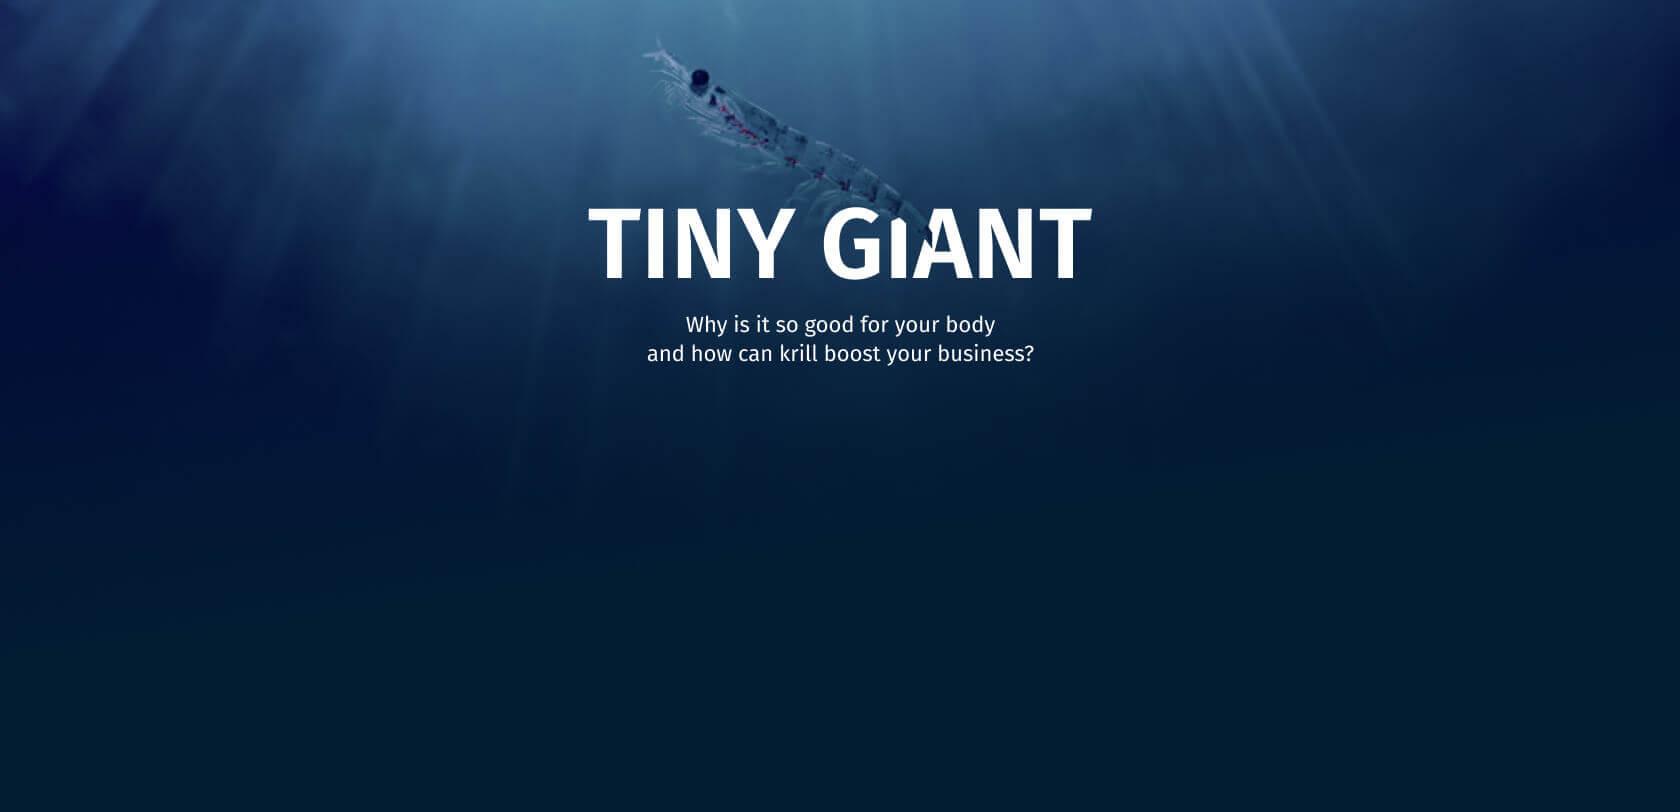 Tiny Giant - Desktop (1)